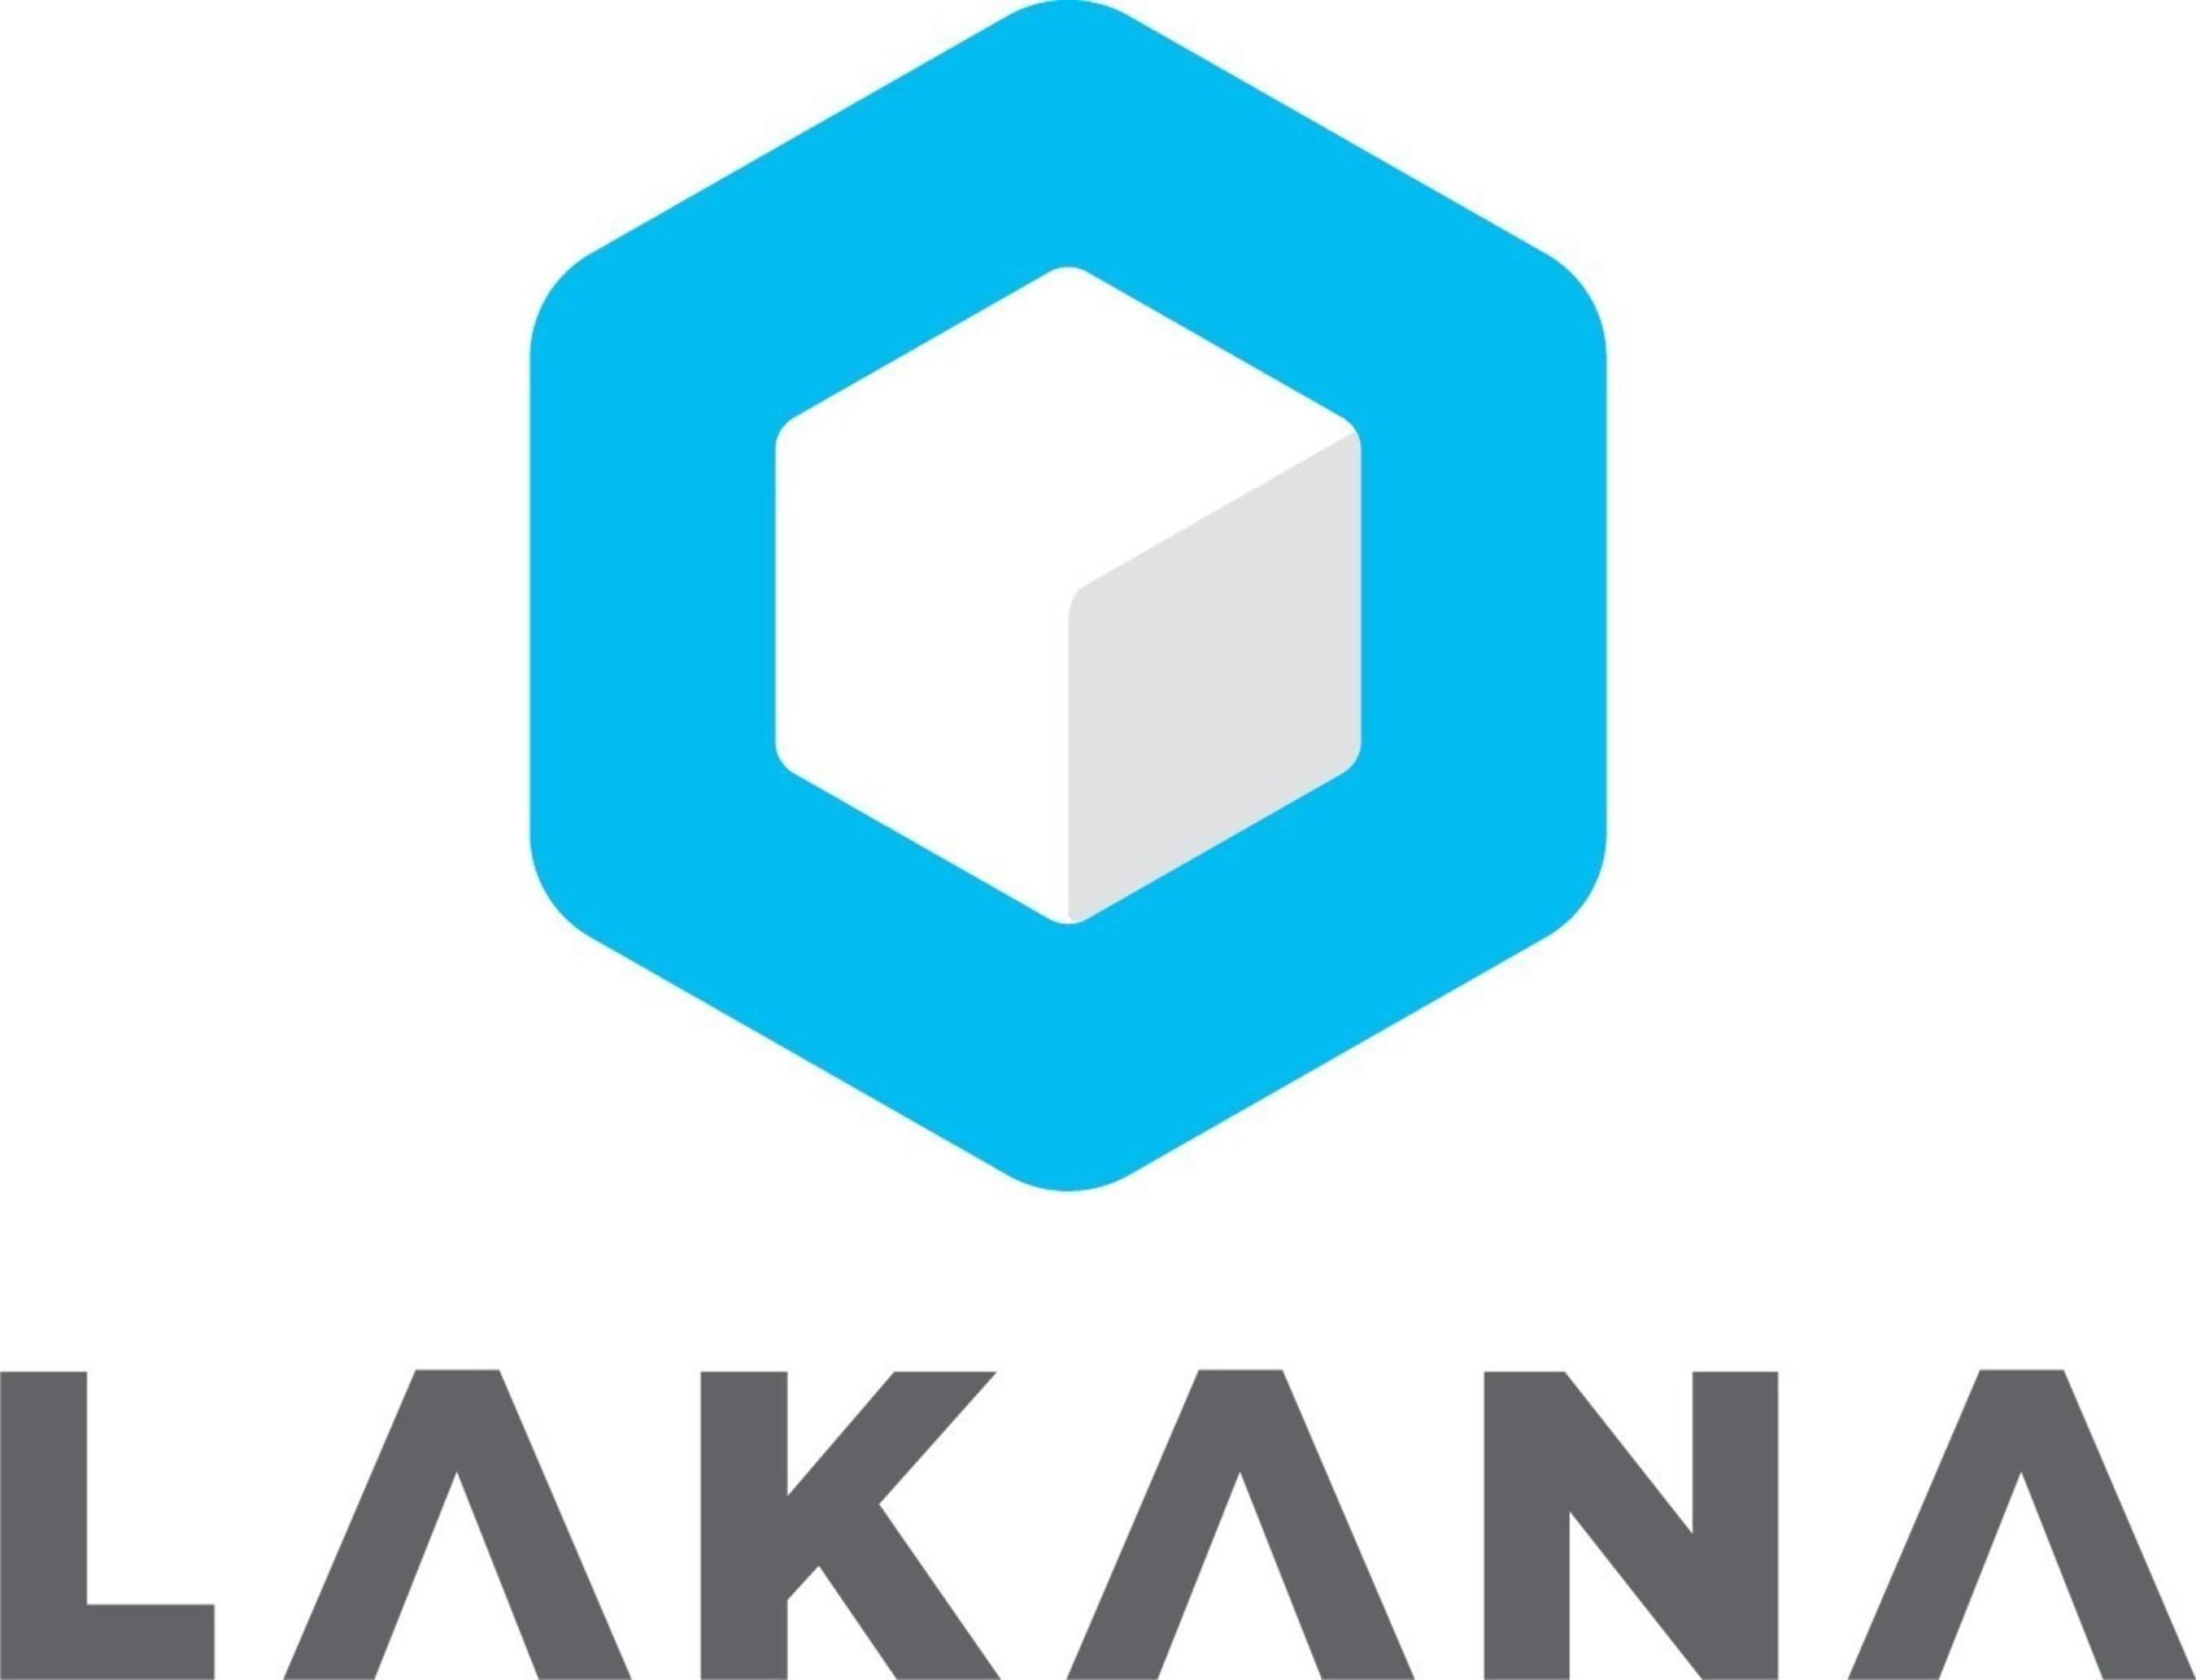 Proven Digital Media And Marketing Executive, Elizabeth Osder, Named Head of Revenue At LAKANA